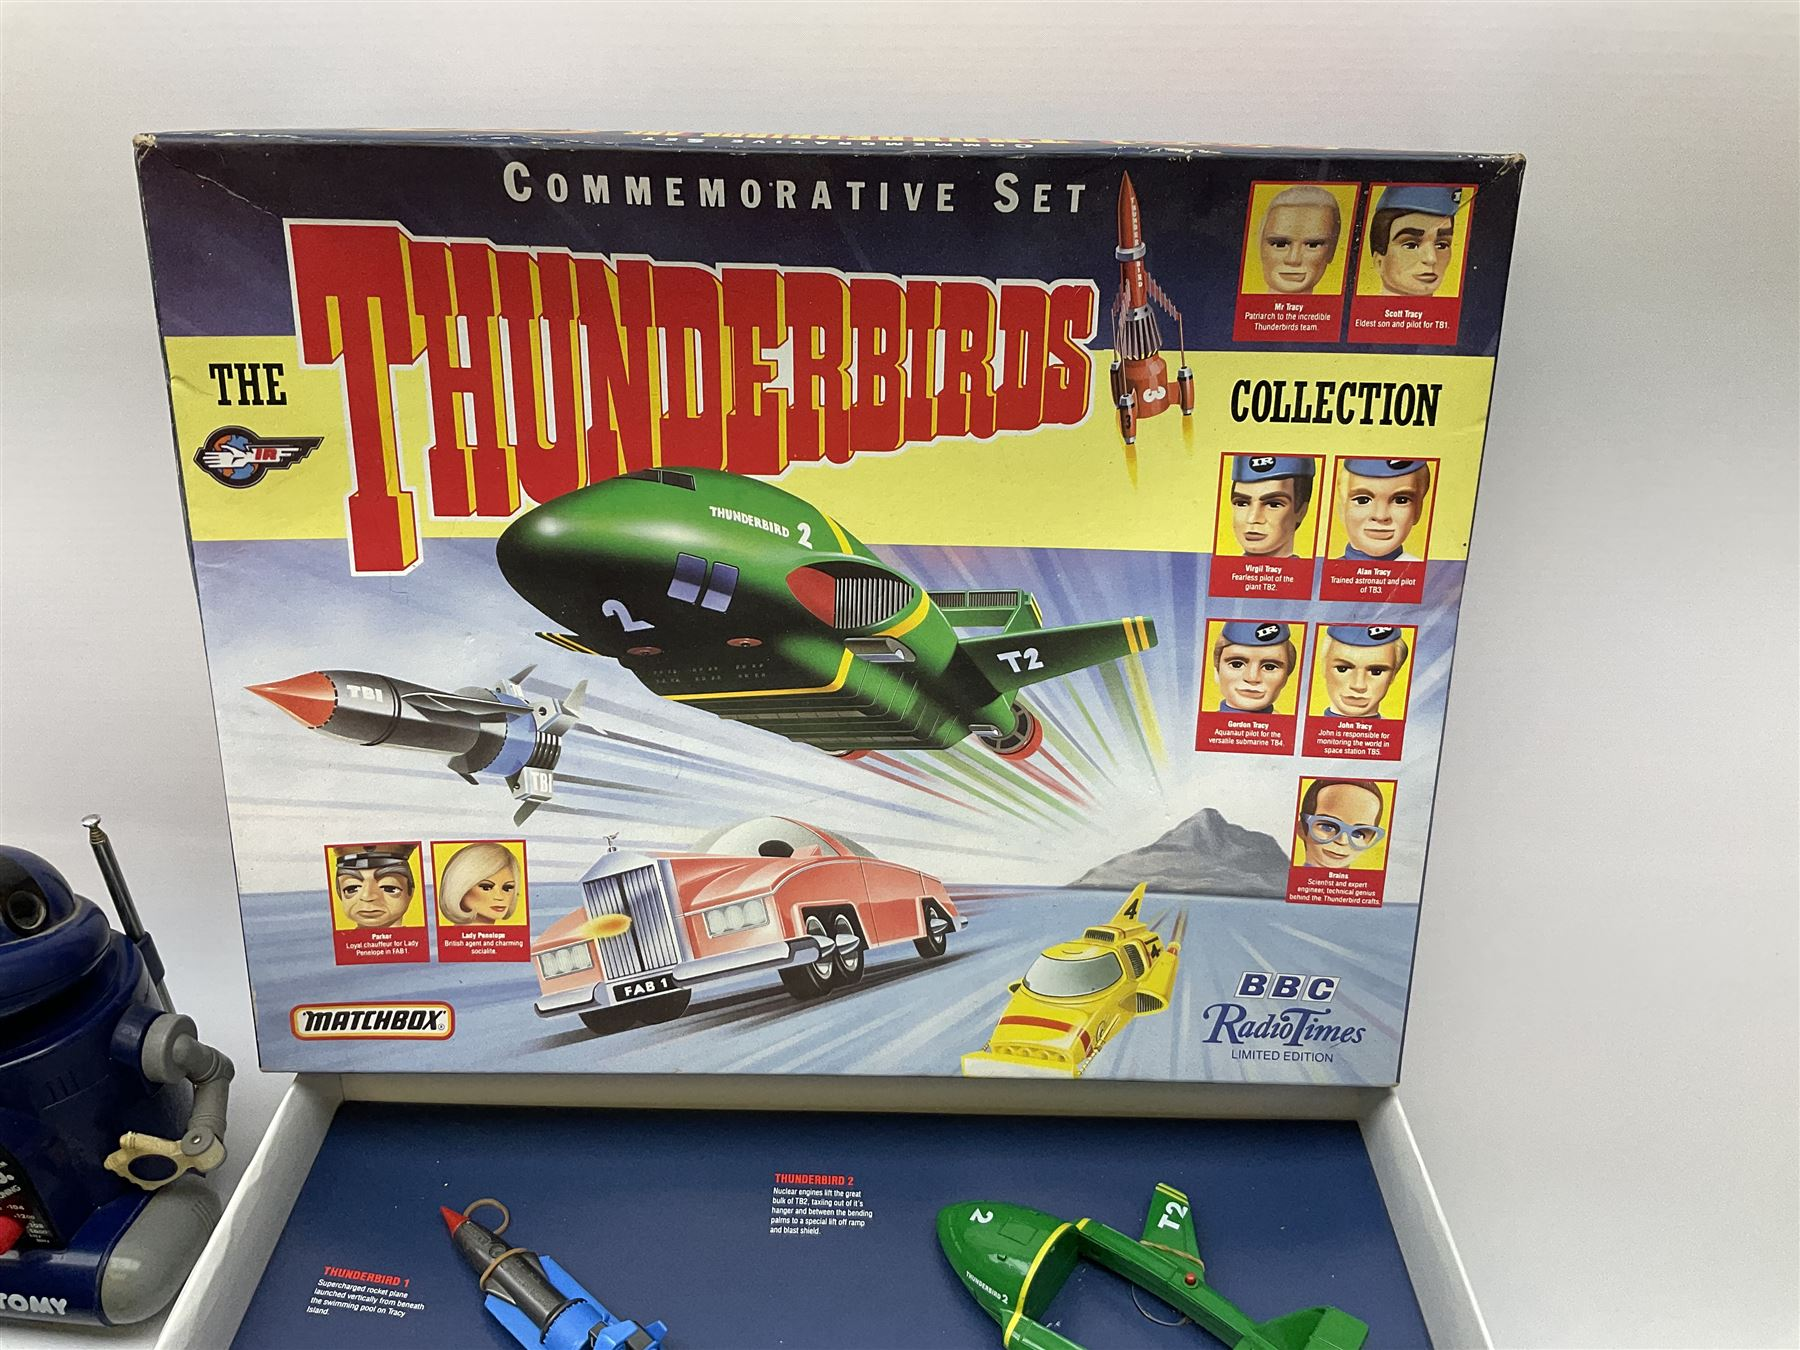 Matchbox 'The Thunderbirds' limited edition Commemorative Set - Image 5 of 7